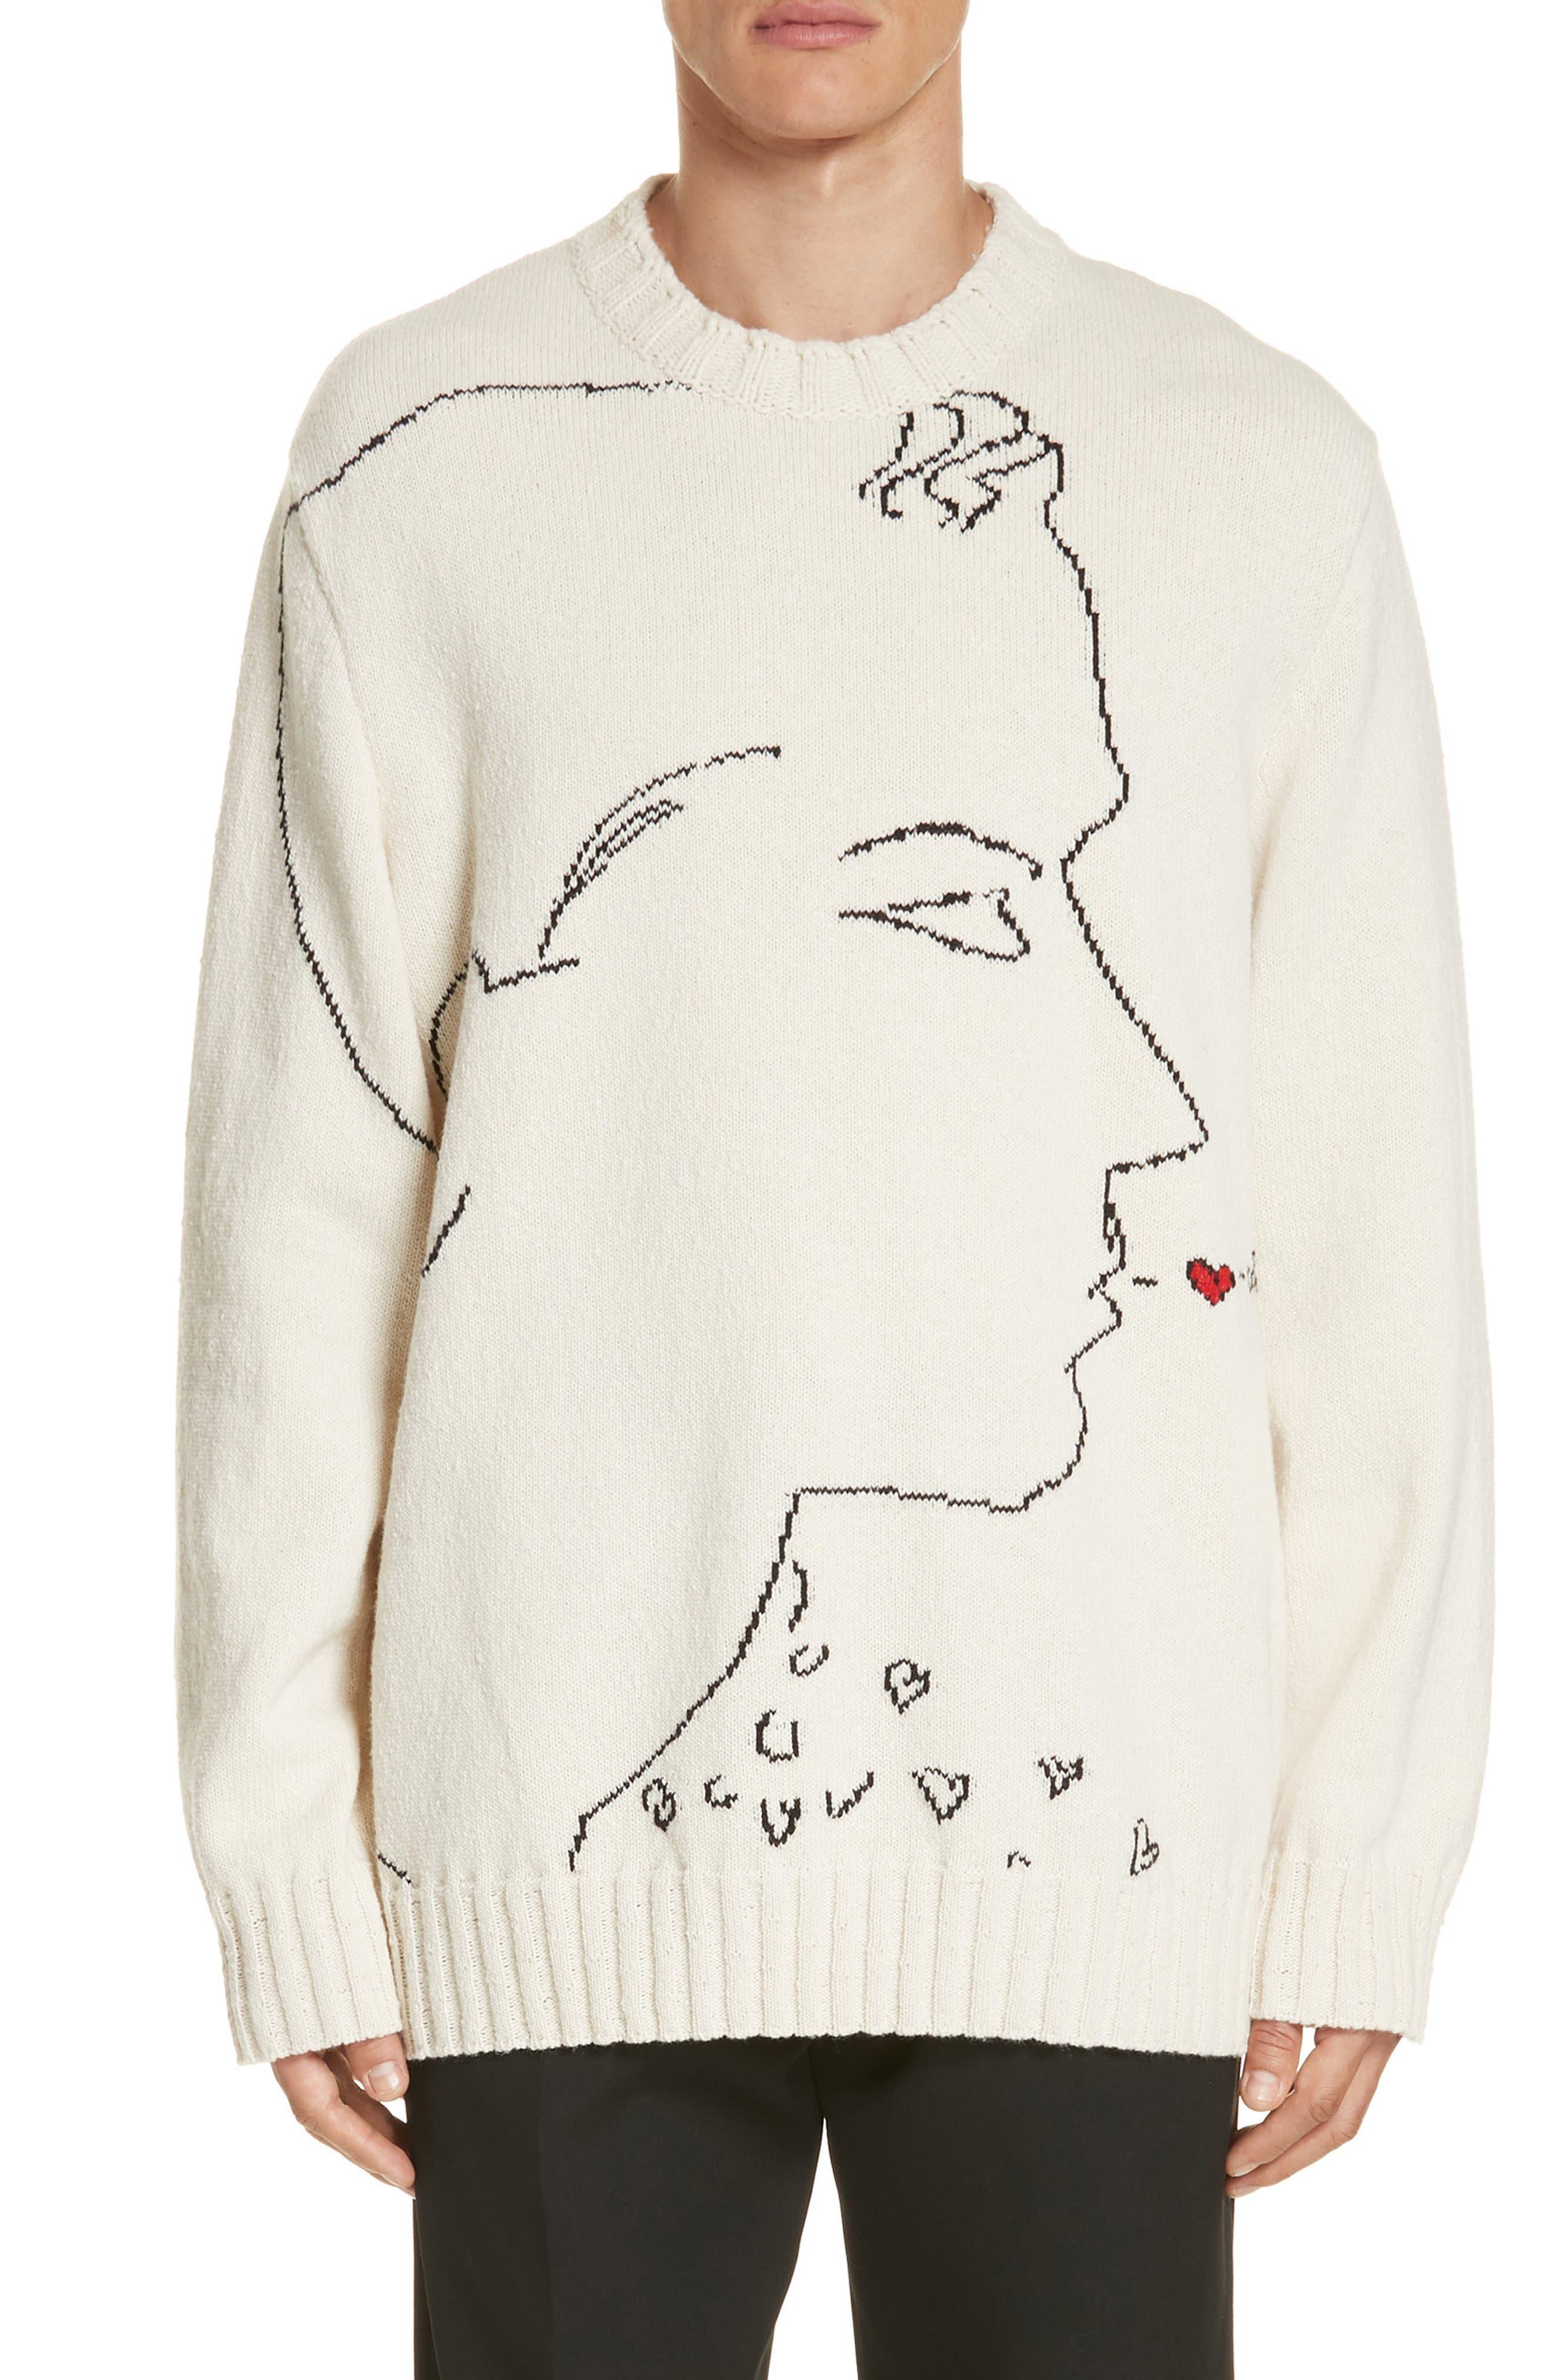 CALVIN KLEIN 205W39NYC Print Wool Sweater, Main, color, ECRU BLACK RED